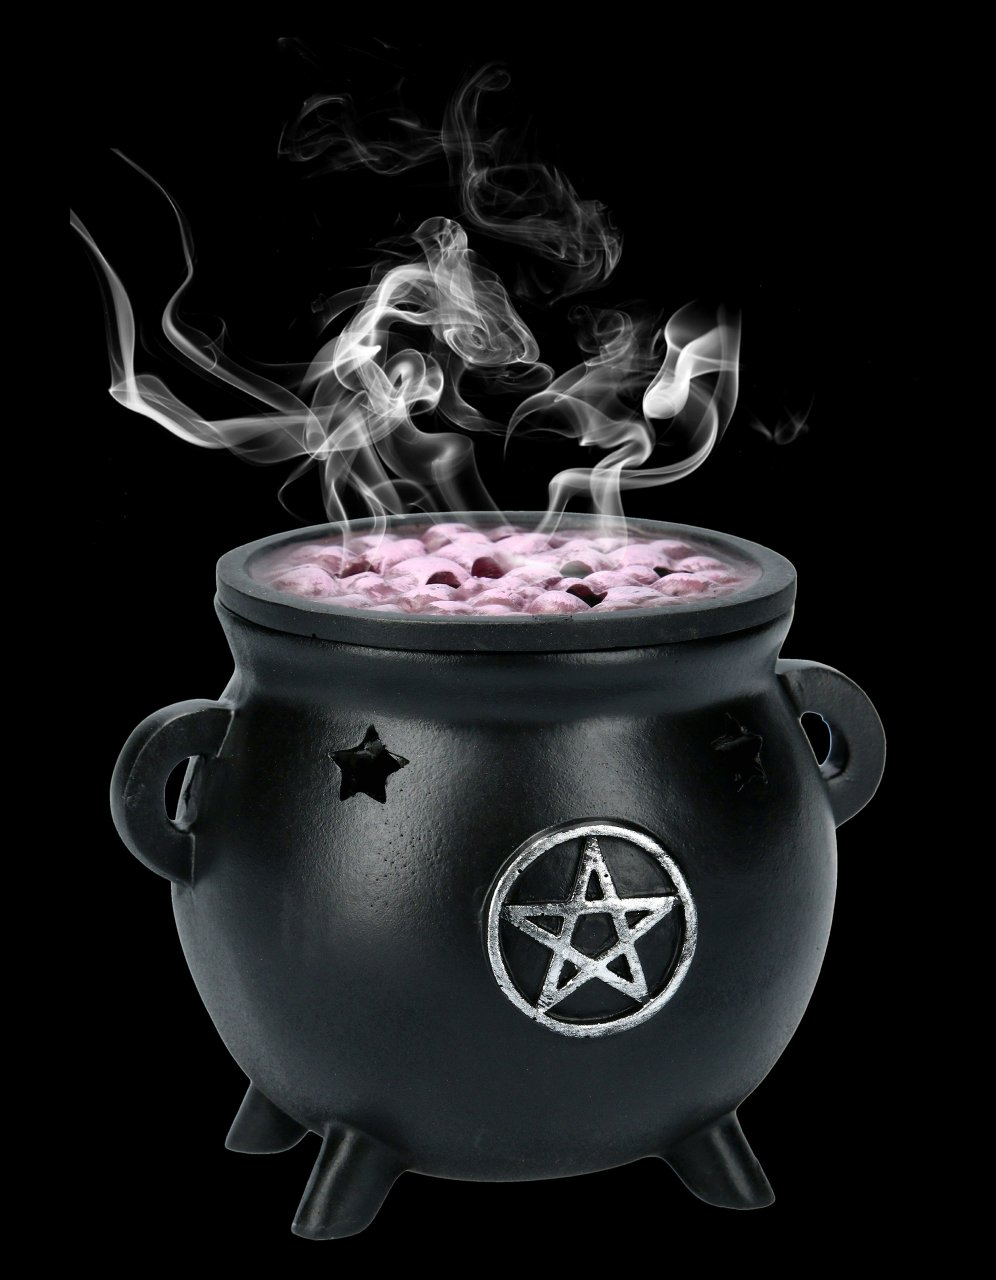 Incense Cone Holder - Pentagram Cauldron